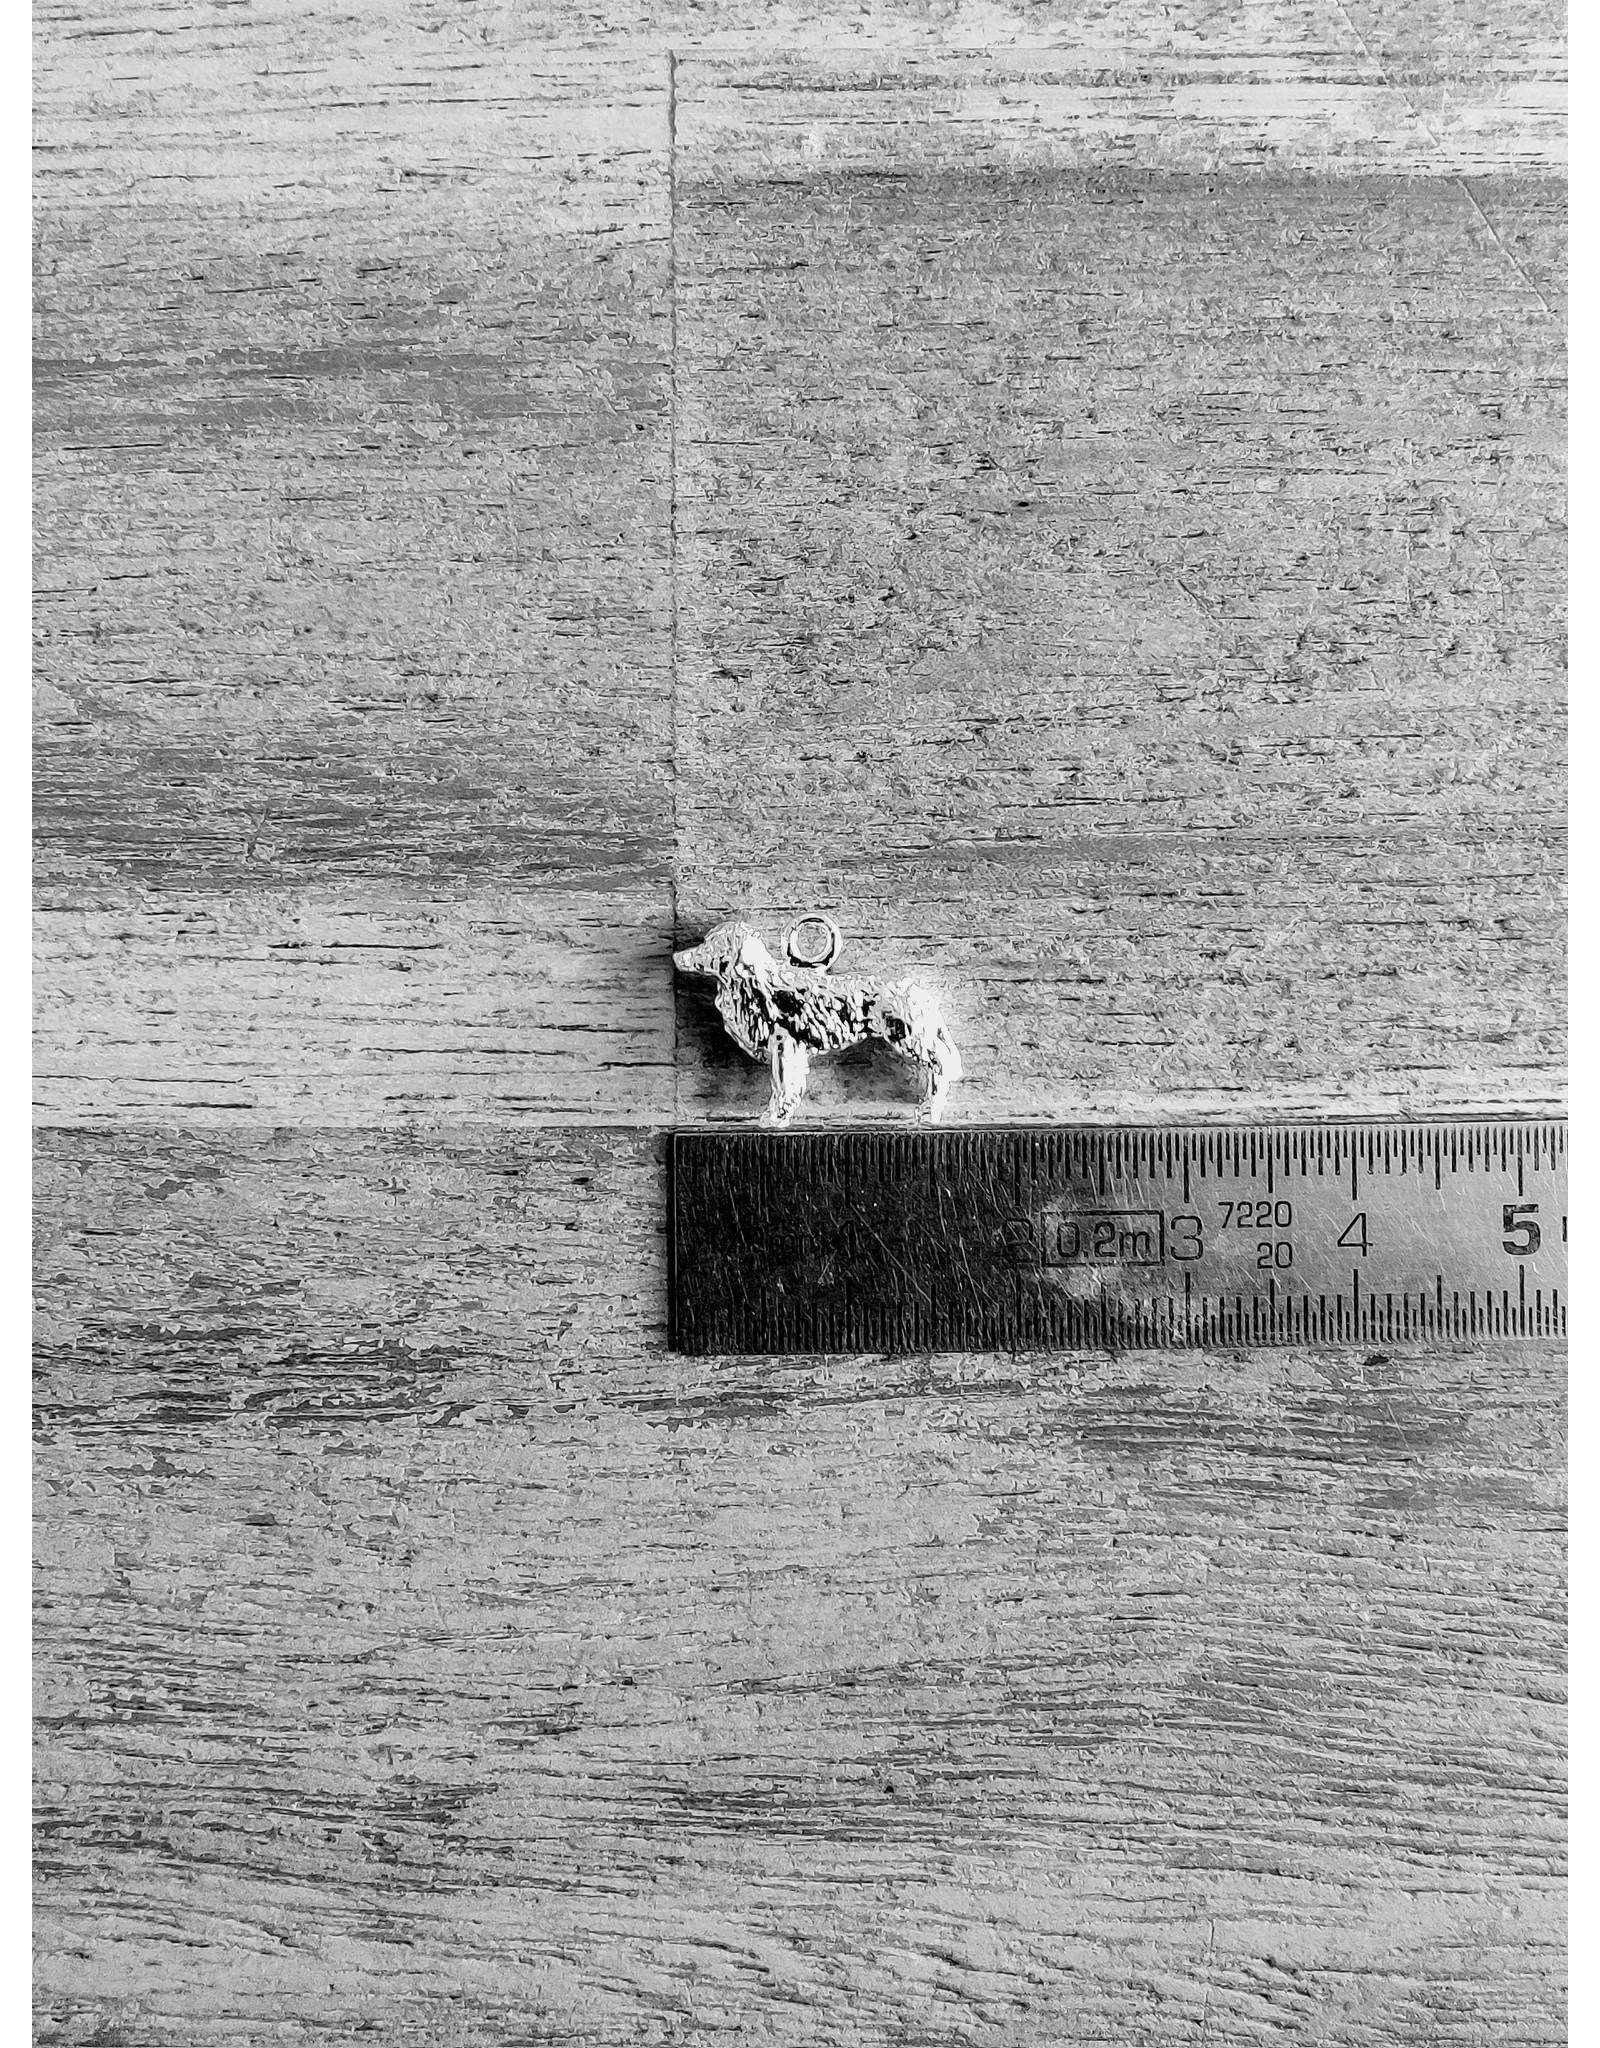 Handmade by Hanneke Weigel Sterling silver Nova scotia duck tolling retriever